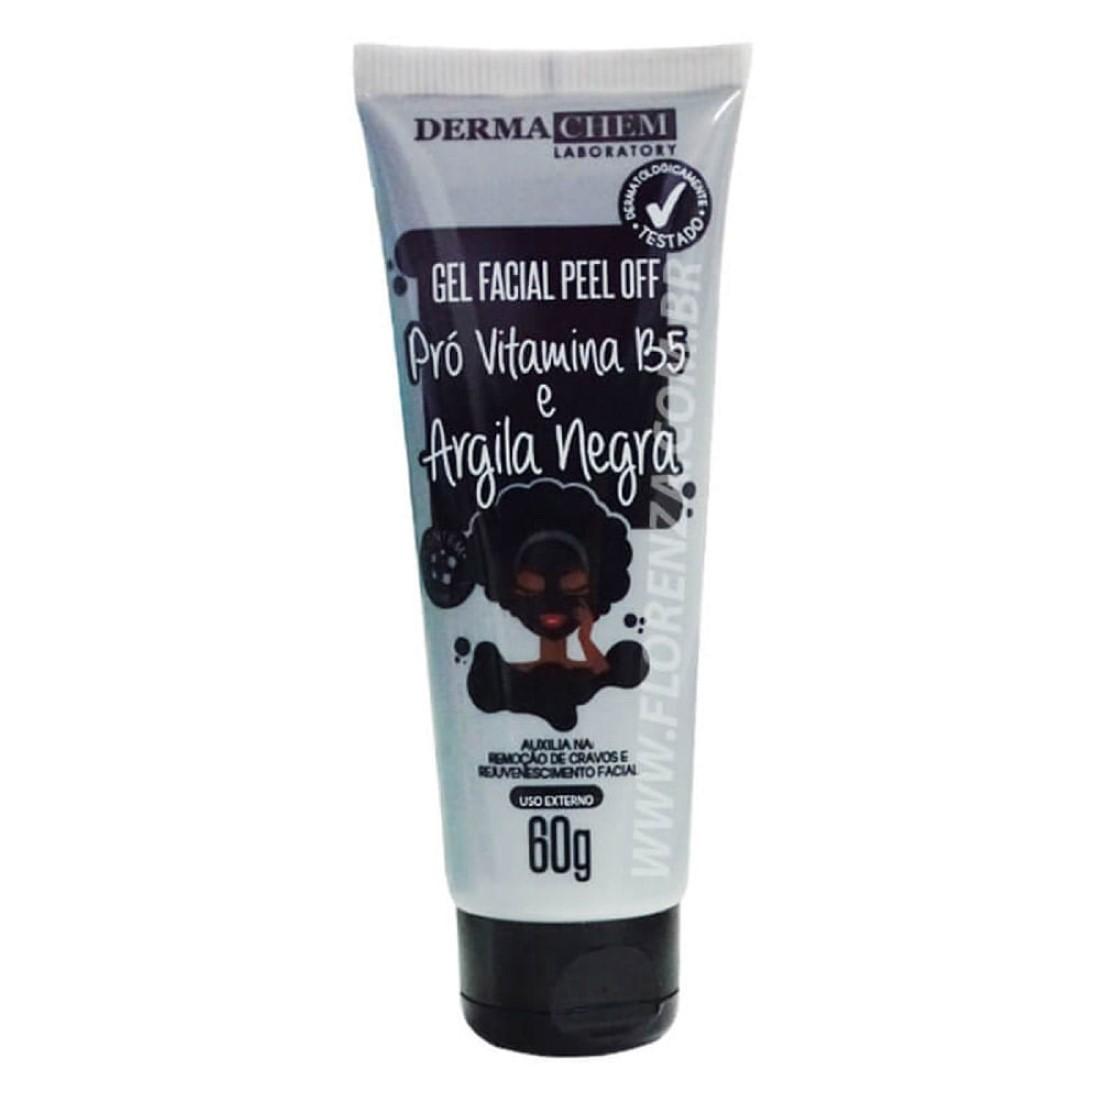 Gel Facial Peel Off Pró Vitamina B5 e Argila Negra 60g - Derma Chem